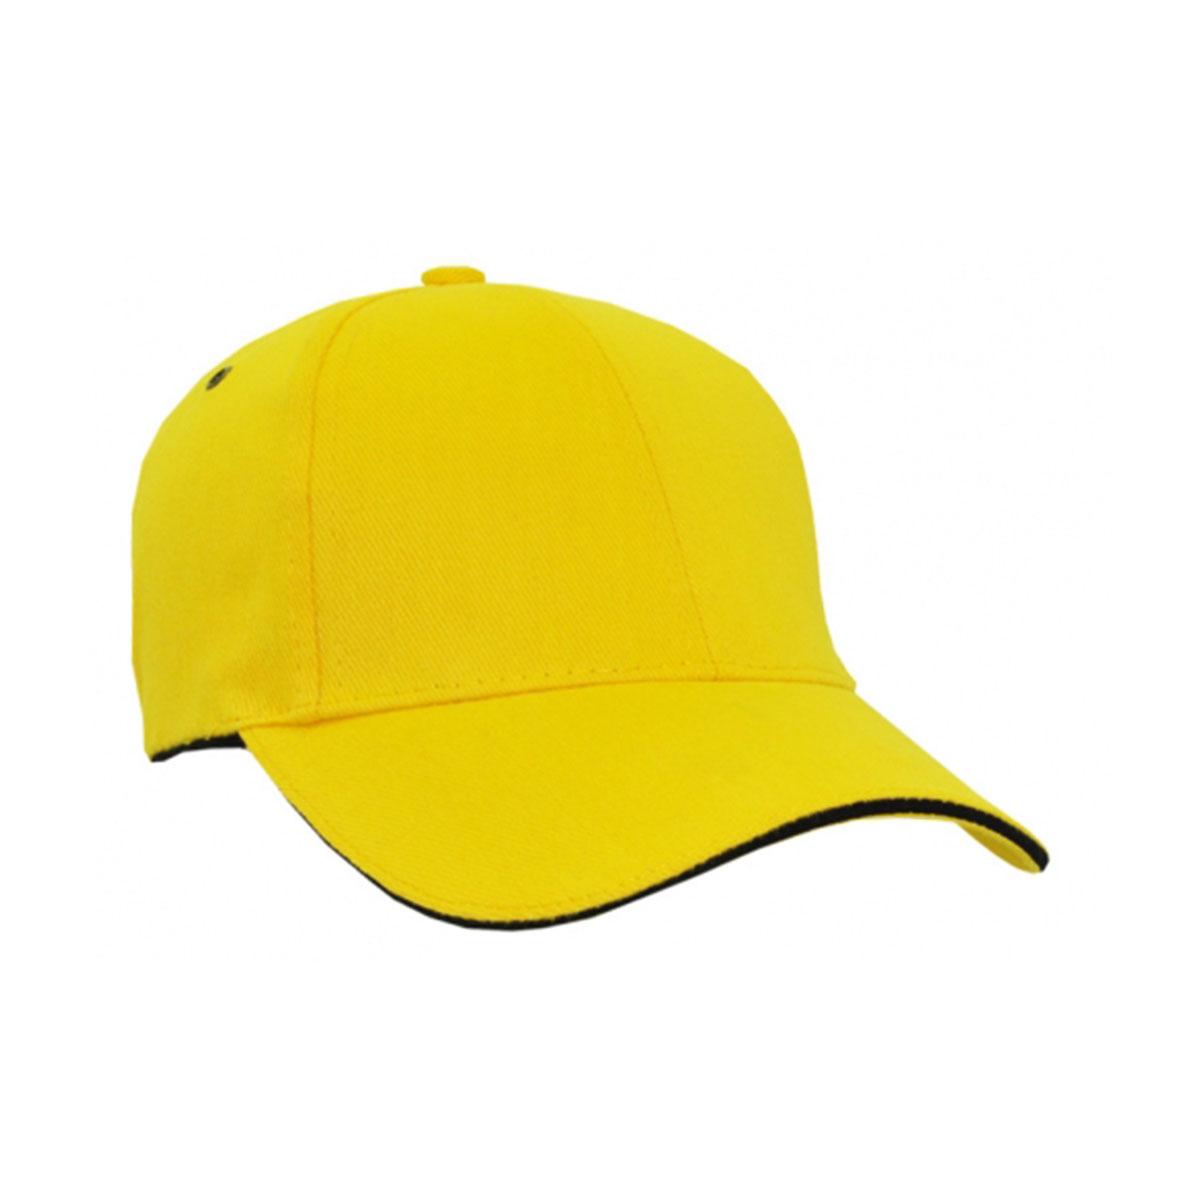 HBC Sandwich Surround Cap-Yellow / Black